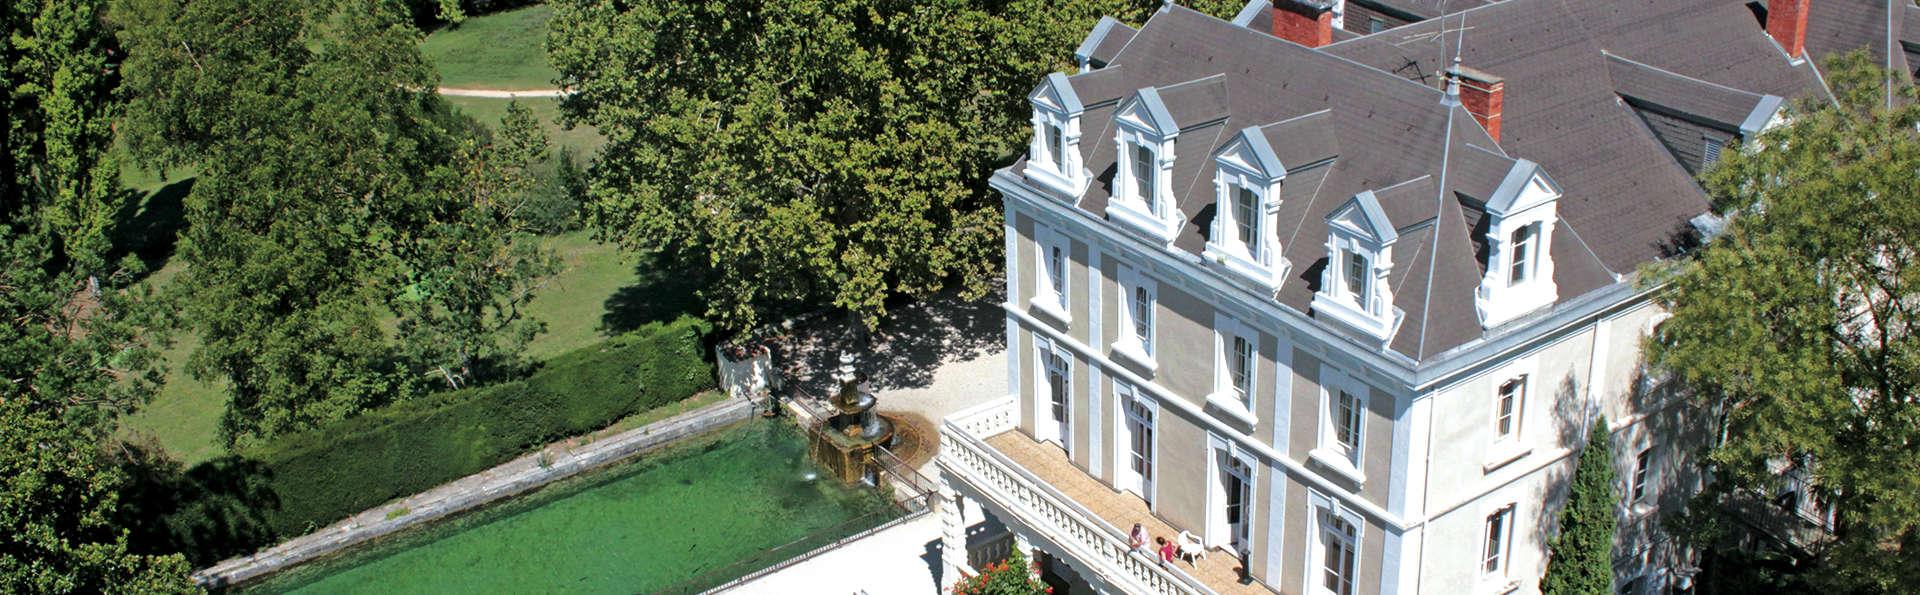 Domaine du Château Laval - EDIT_aerea.jpg